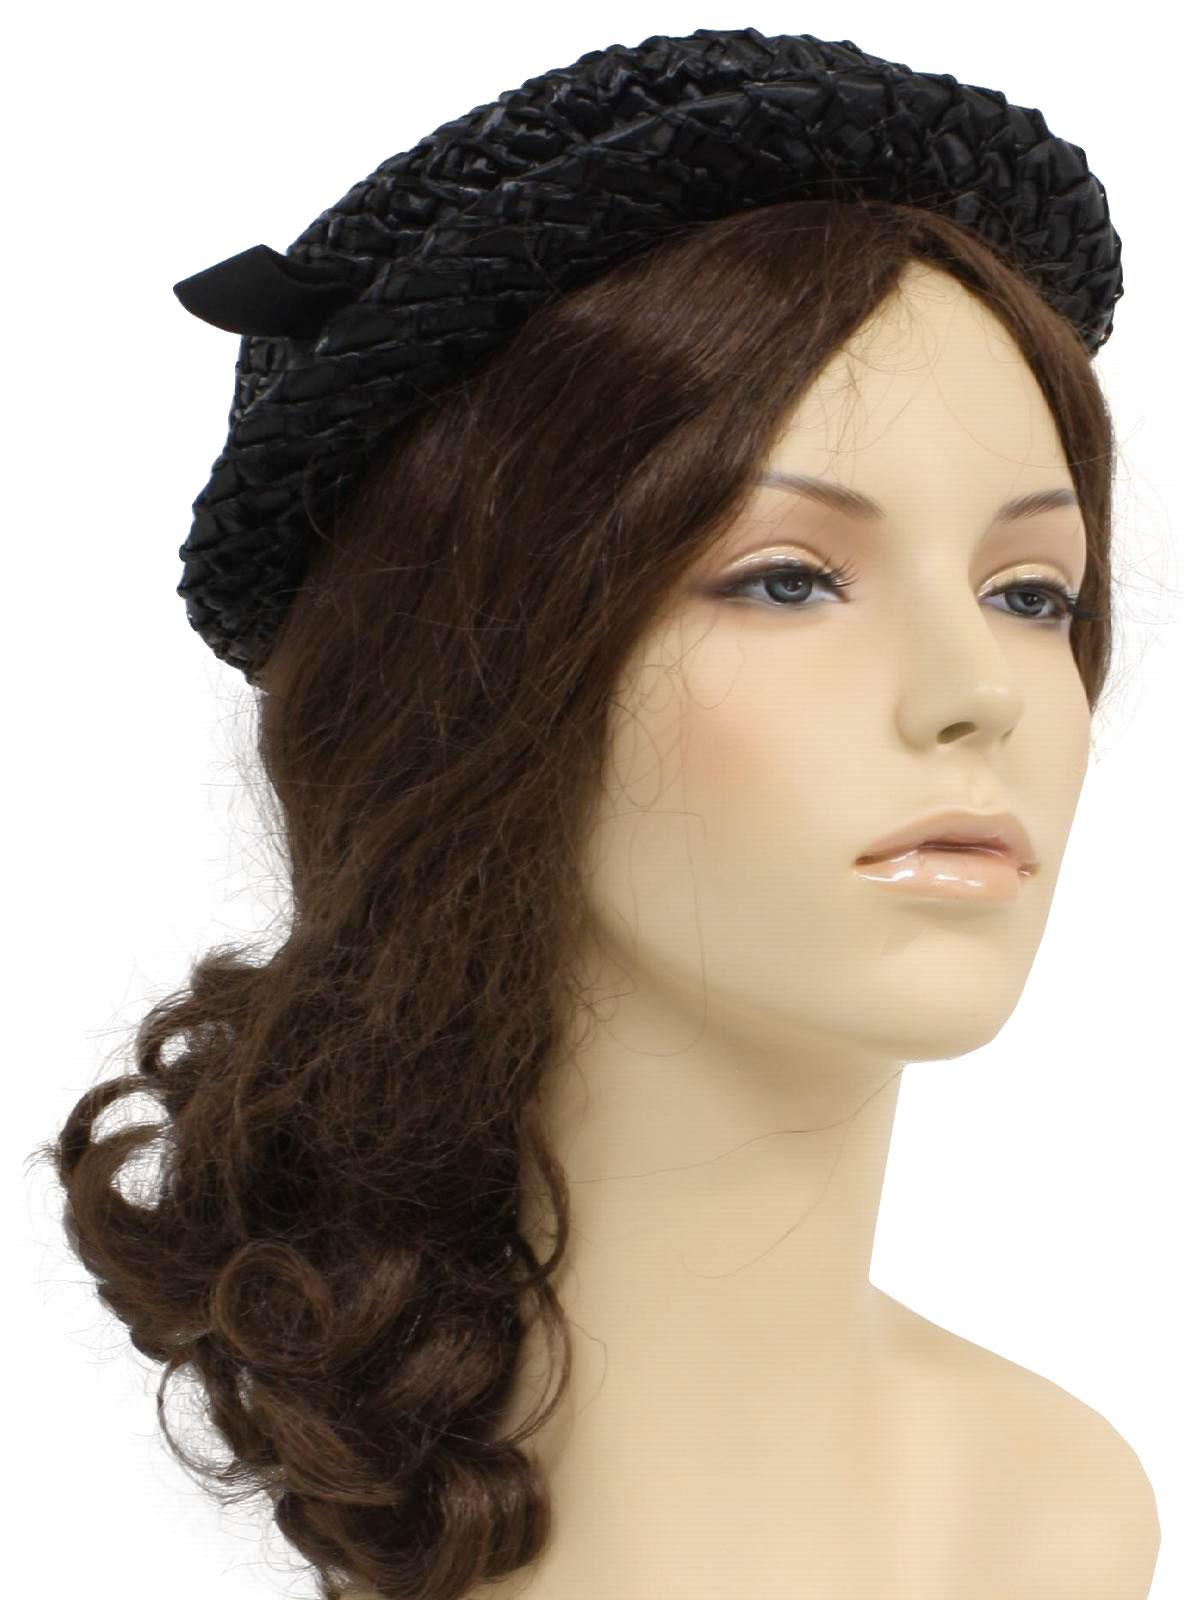 Retro 1950's Hat (Jan Leslie) : late 50s -Jan Leslie- Womens black background woven straw thin ...